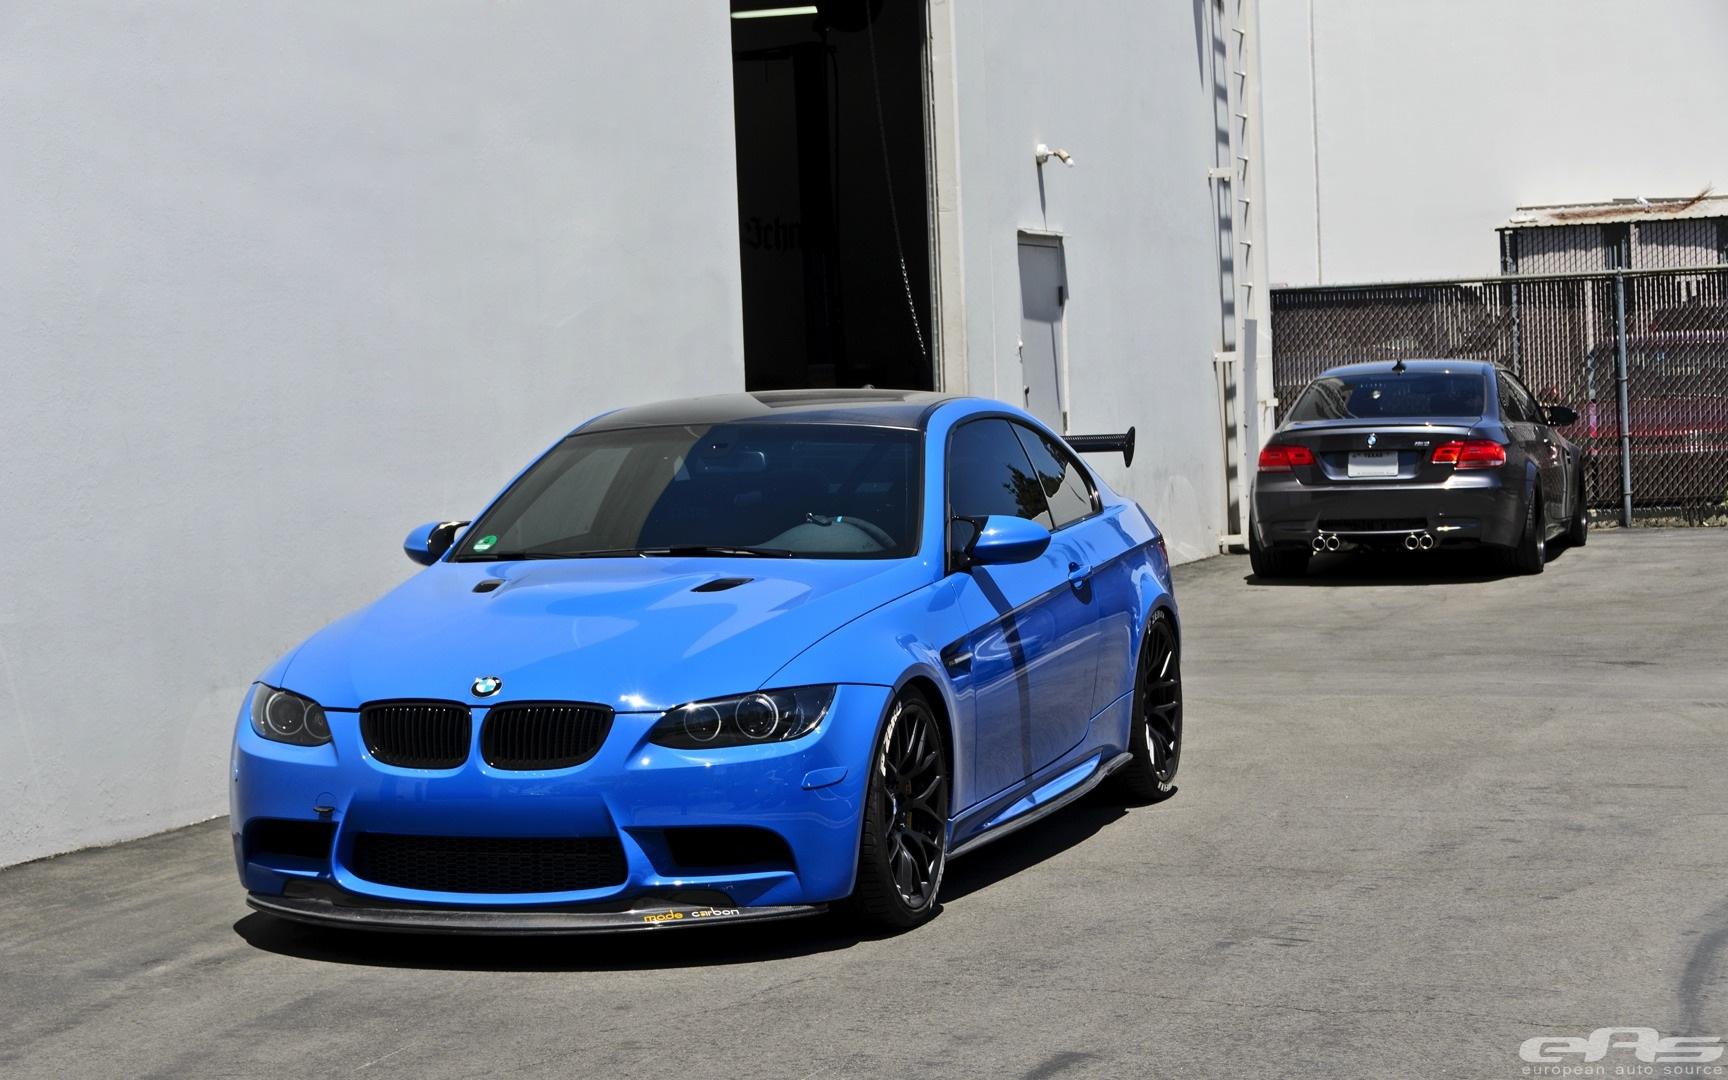 Bmw M Series >> Santorini Blue BMW E92 M3 Gets Serious at EAS - autoevolution